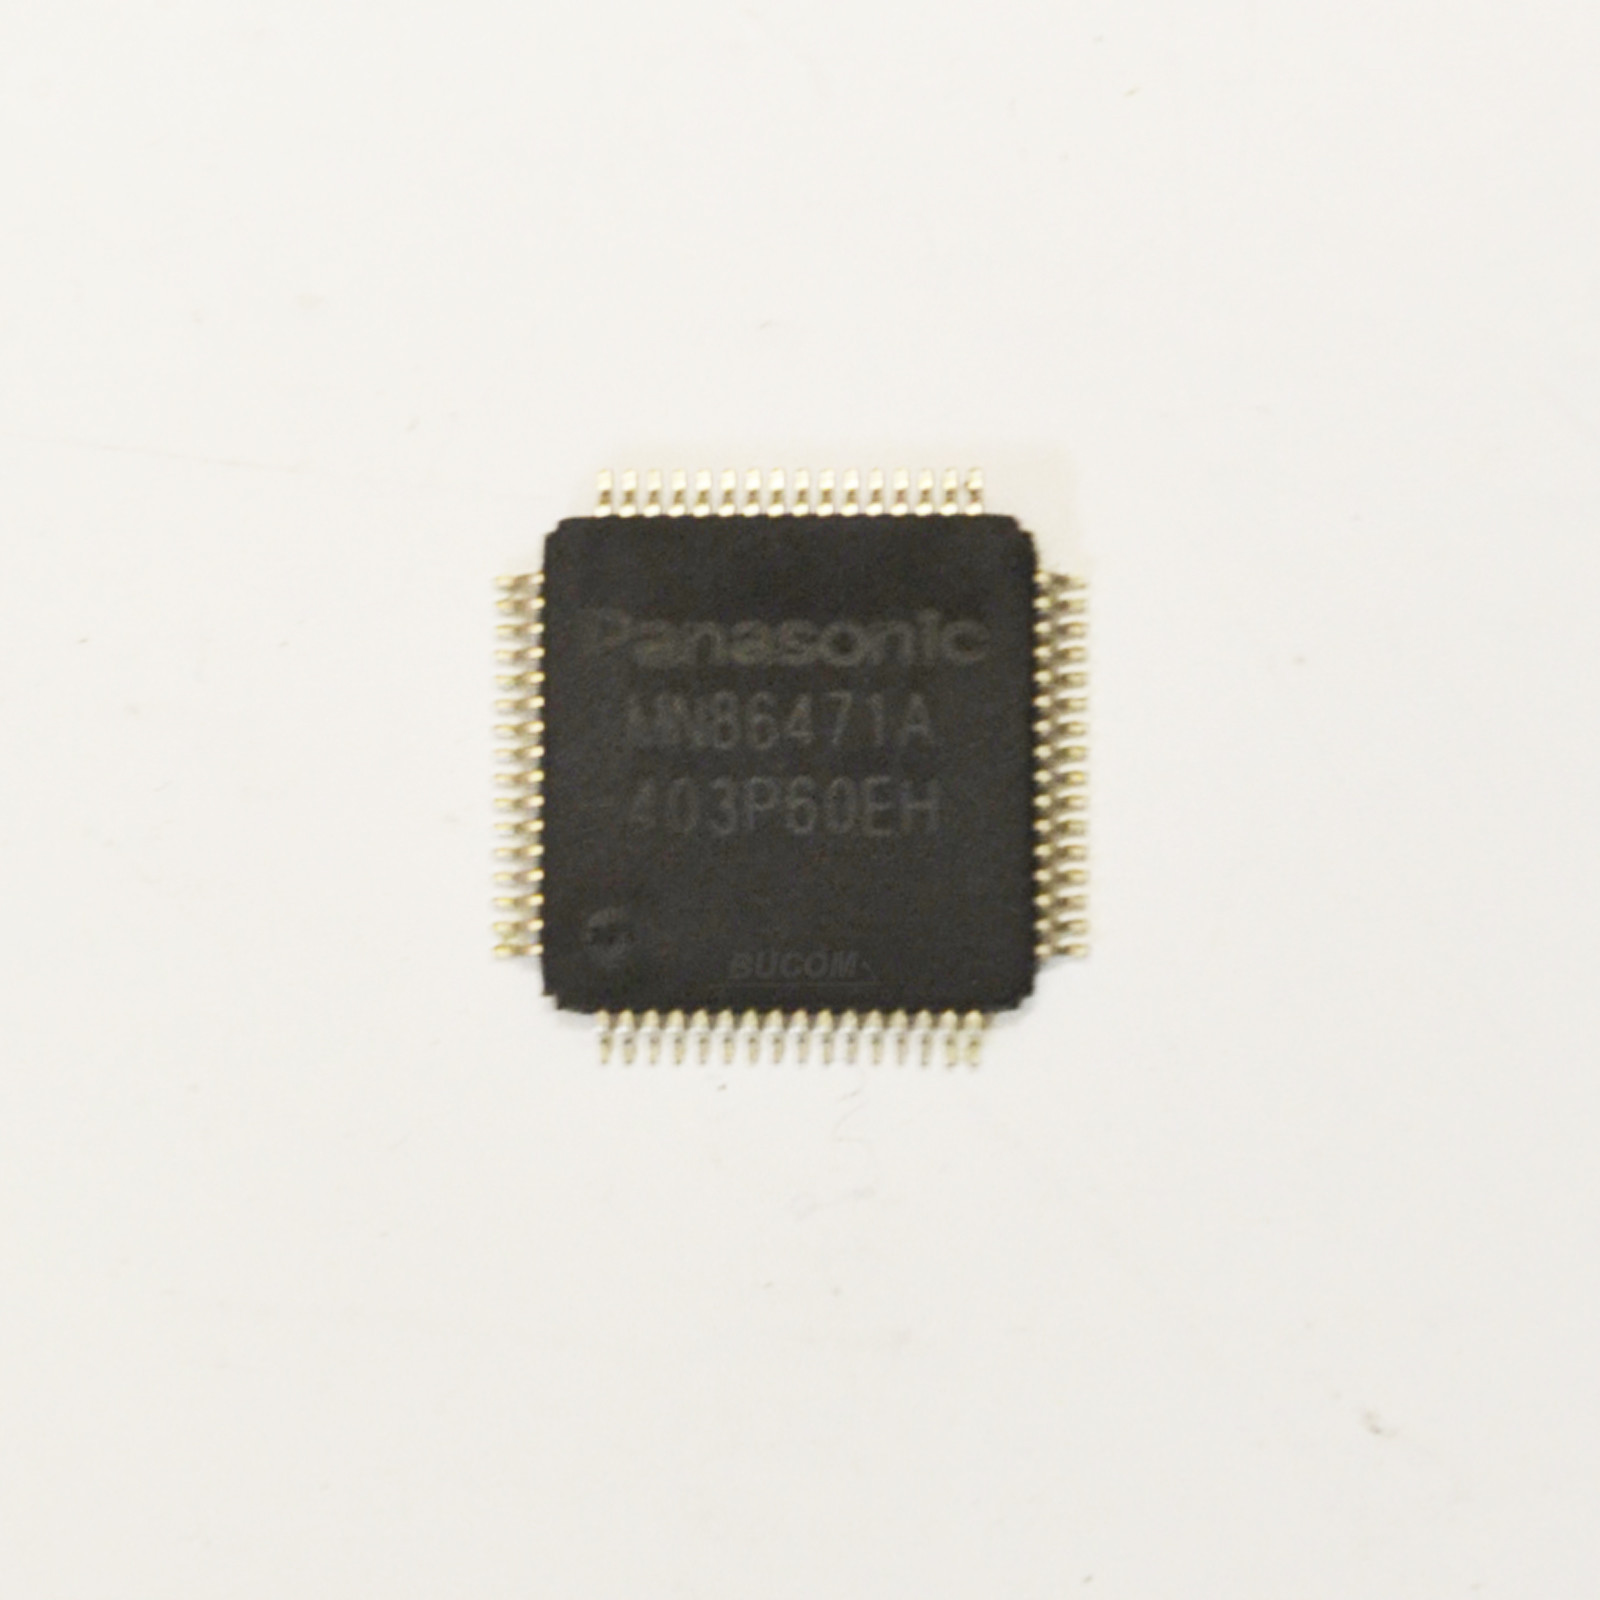 Sony Playstation PS4 HDMI Chip IC Panasonic MN86471A Schaltkreis